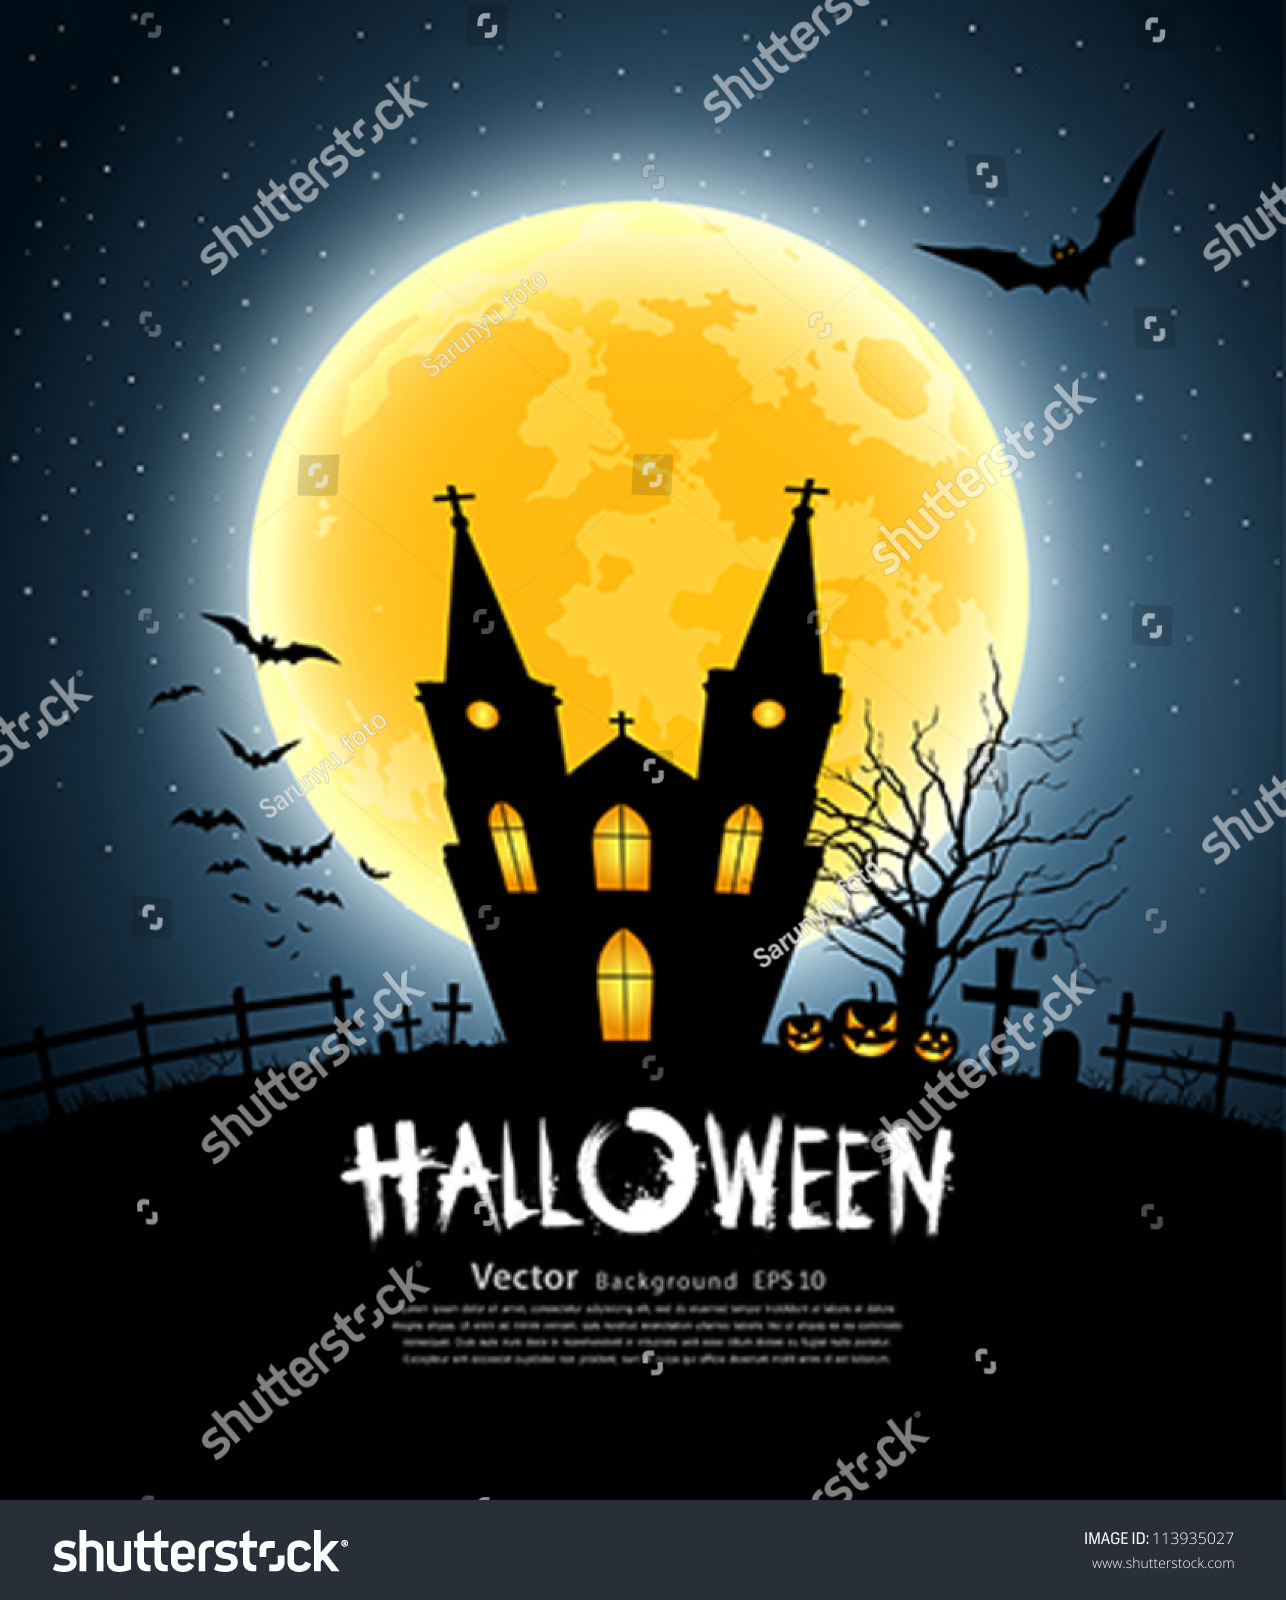 Halloween House Party Full Moon Vector Stock Vector 113935027 ...